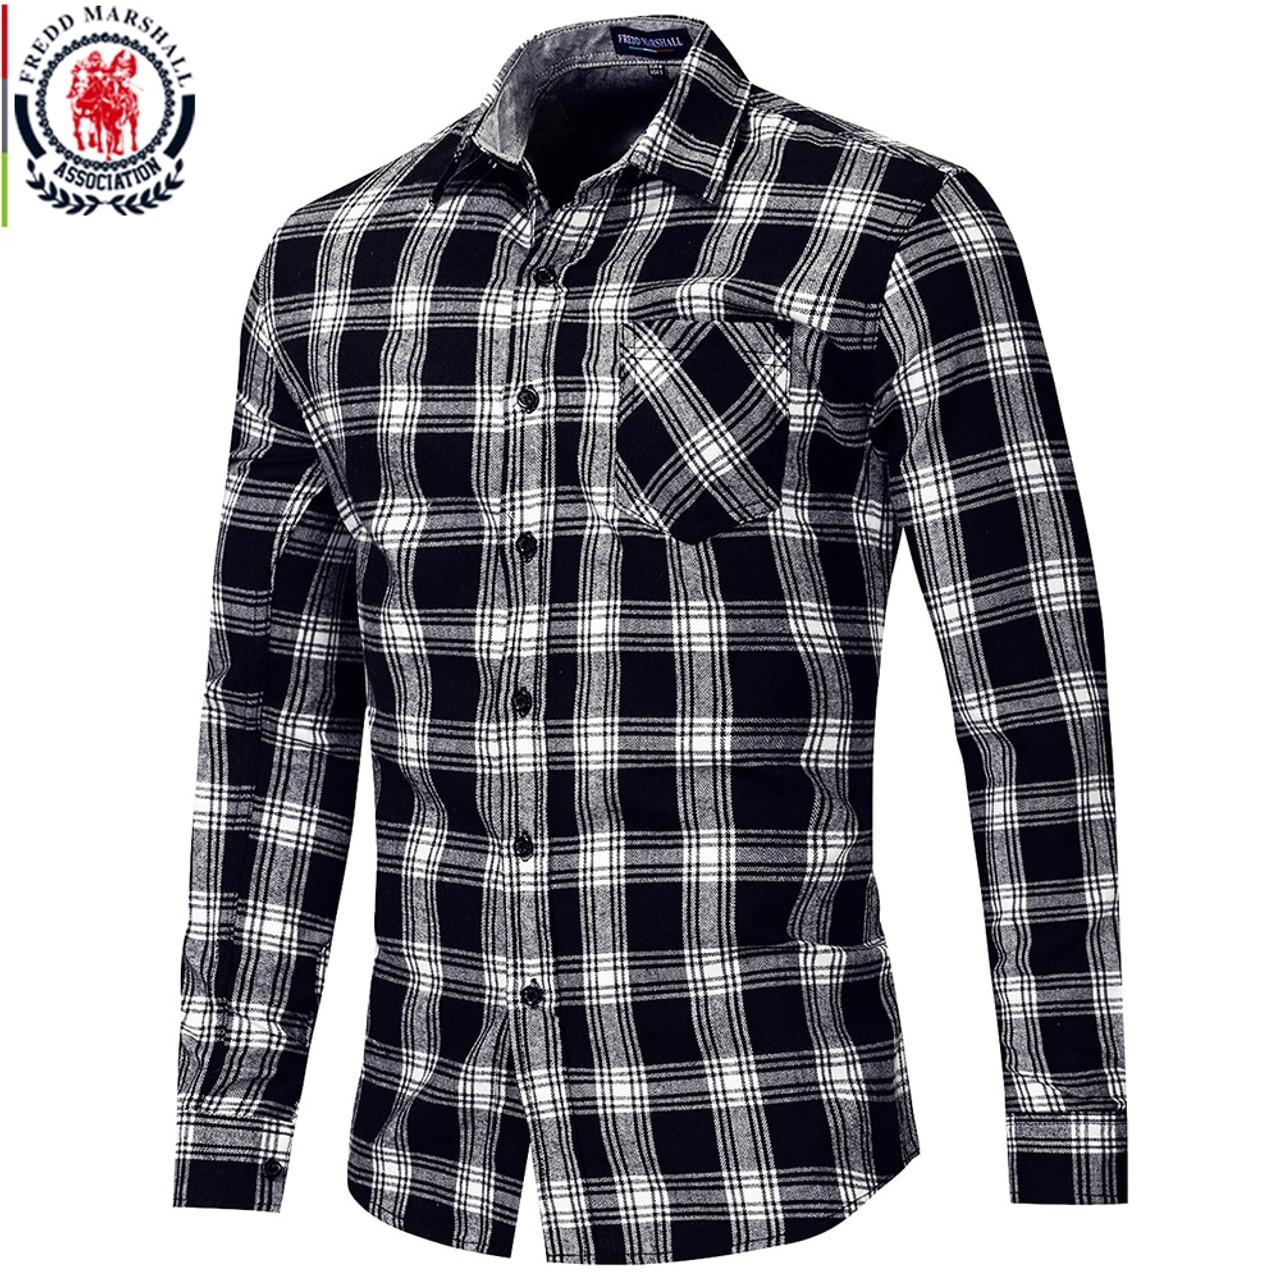 9d42fe99cd Fredd Marshall 2018 Autumn New Long Sleeve Slim Fit Plaid Dress Shirt Men  100% Cotton ...